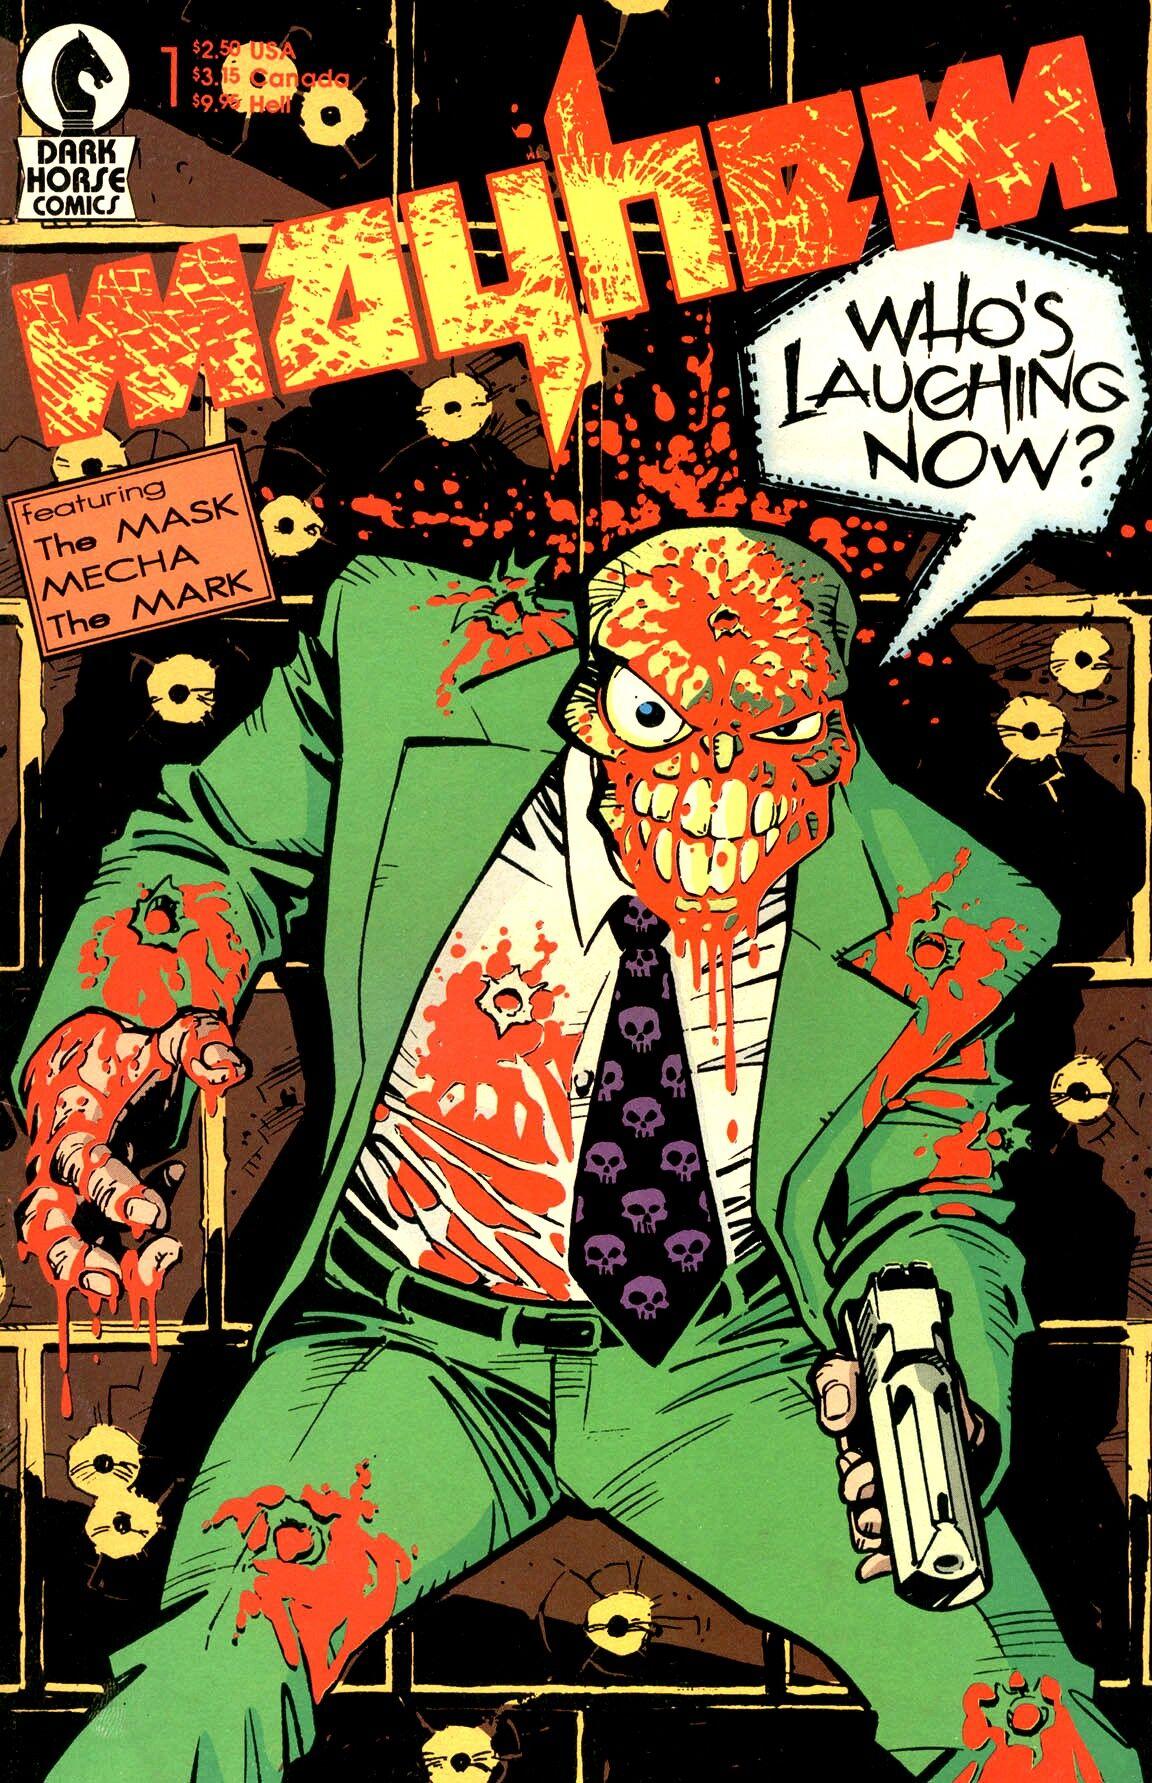 Leer The Mask Mayhem / La Mascara Mayhem Online en Español